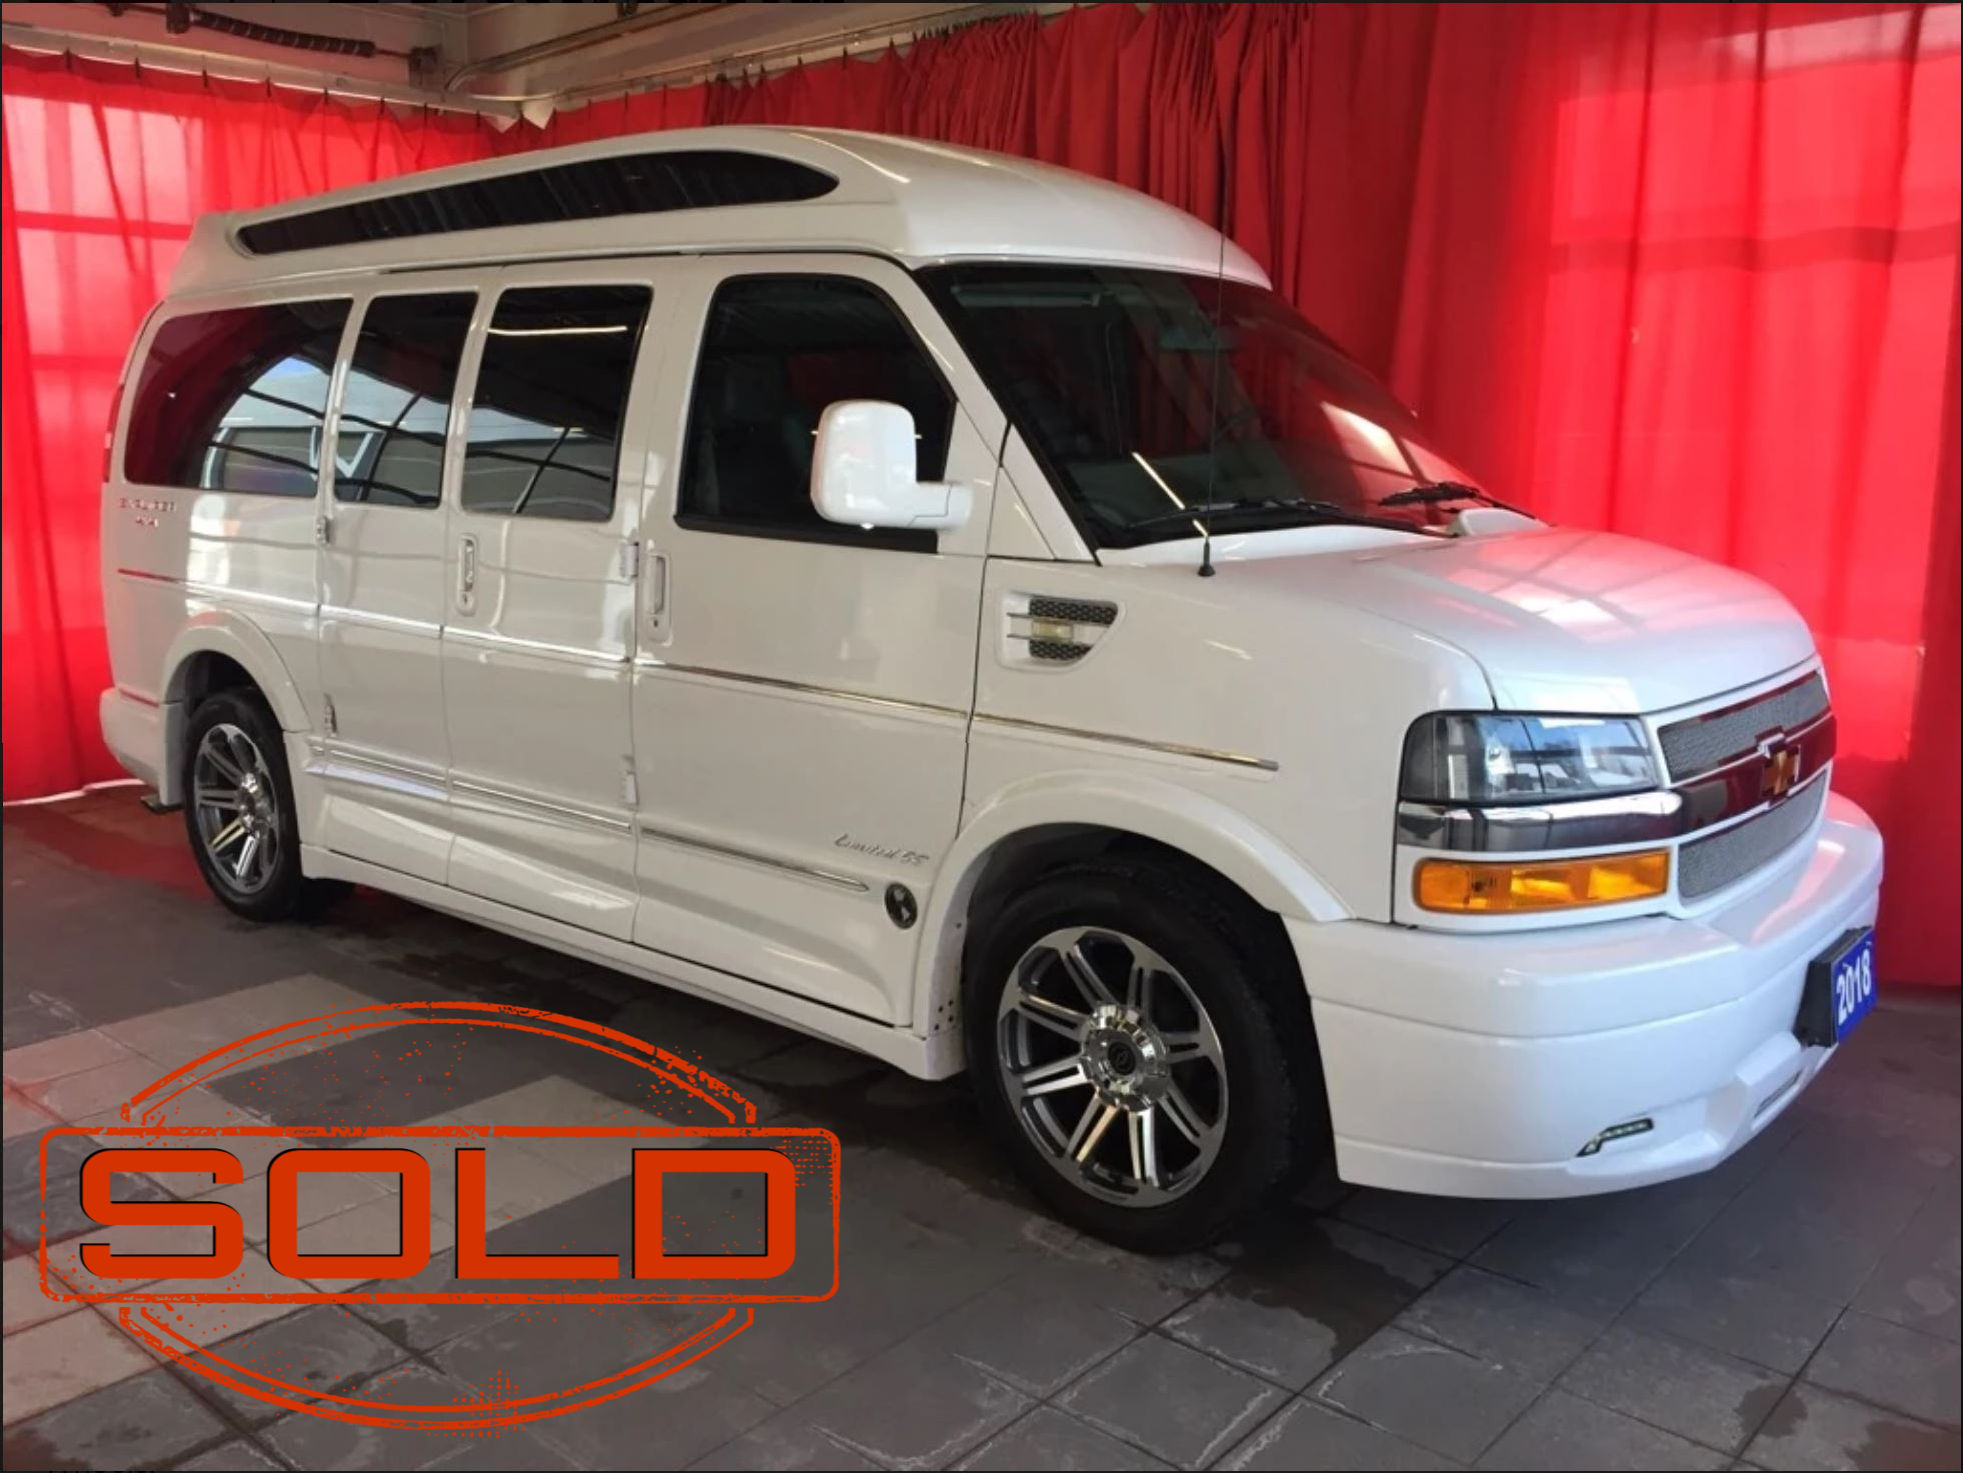 B5463 SOLD - White van(1)